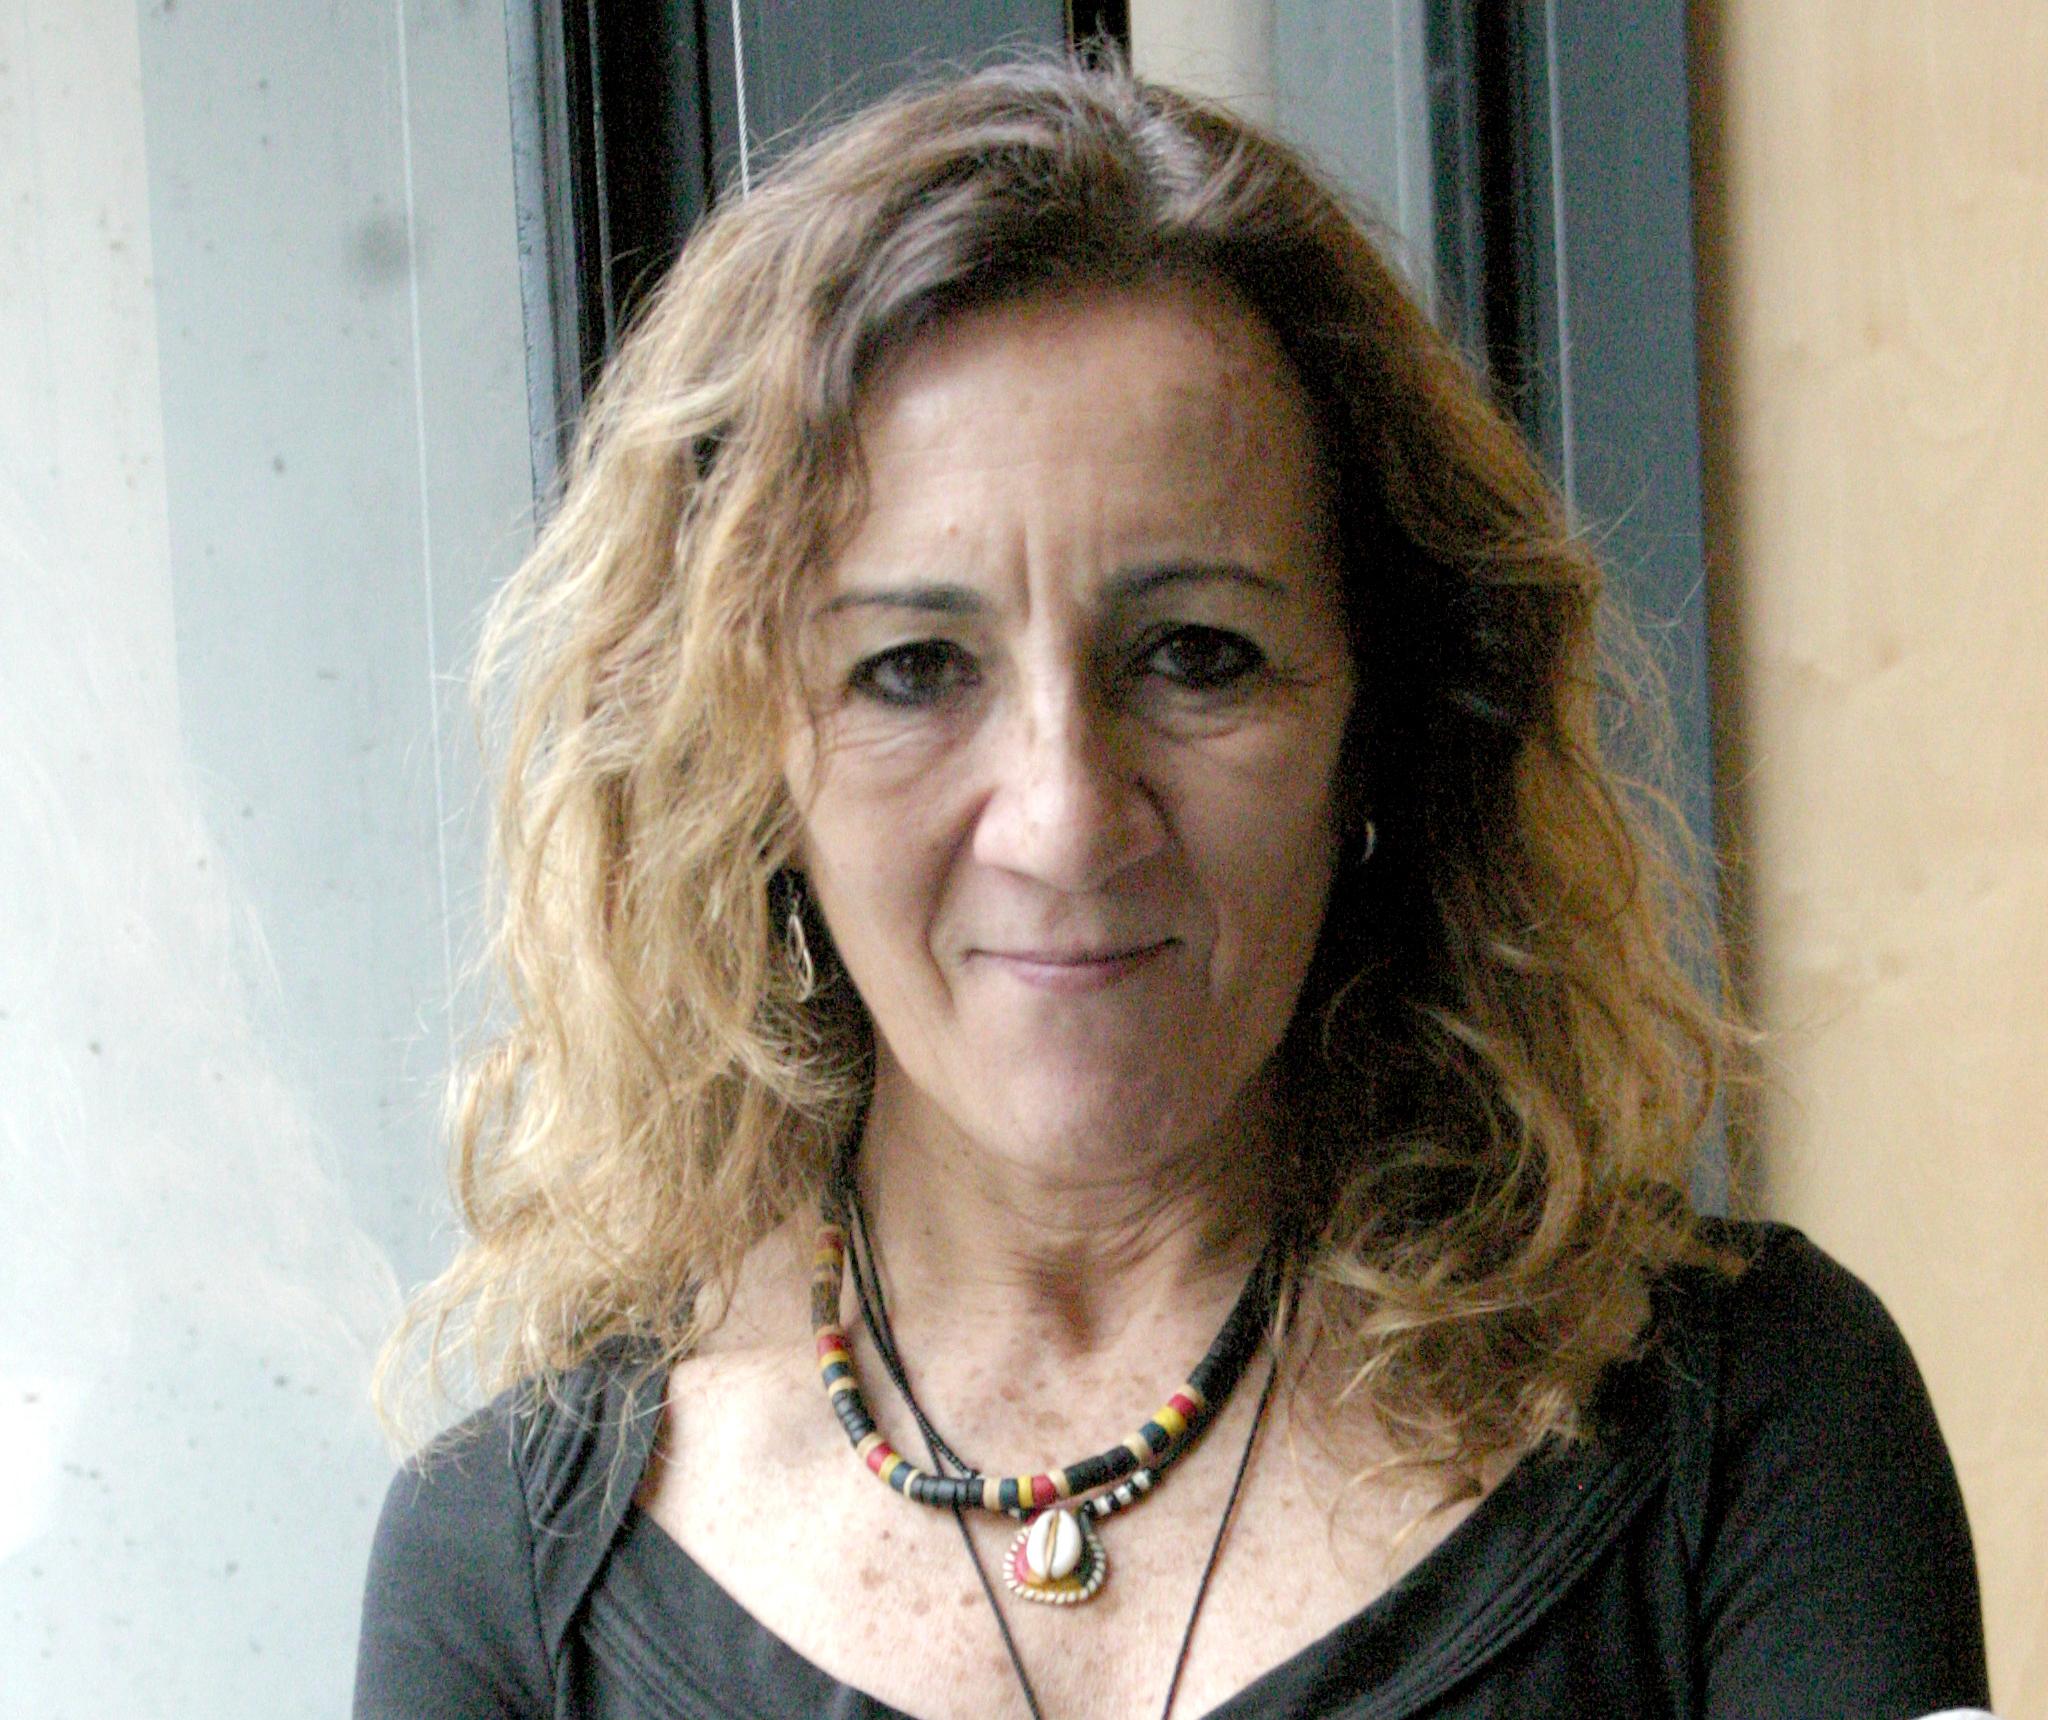 Foto de Carme Portaceli directora del teatro Español de Madrid